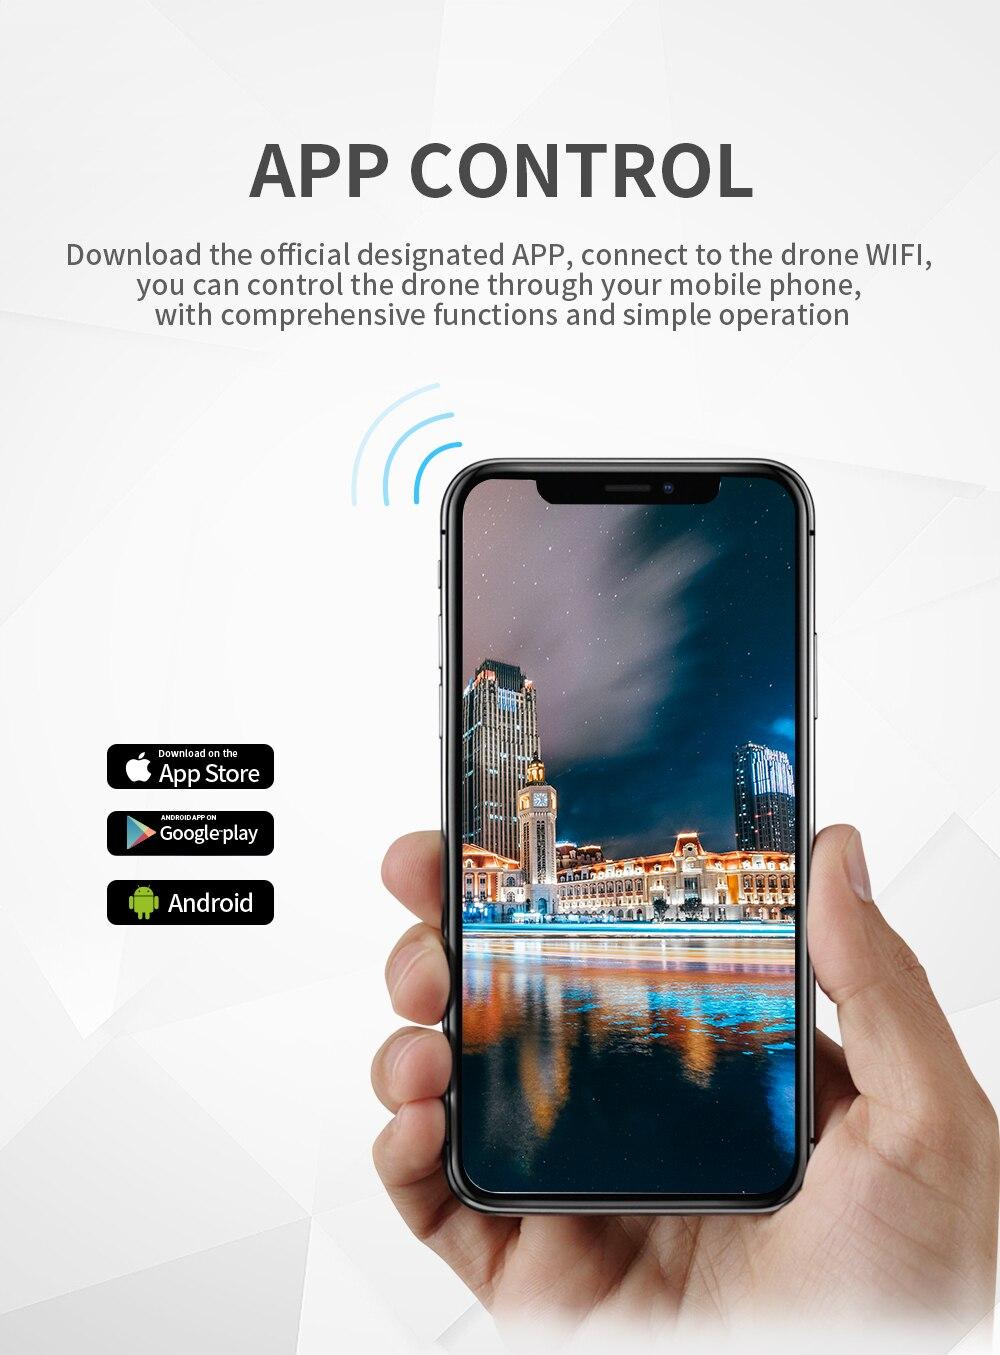 Hd656c968f8c449c19b7a95c1a042d386R - ZLL SG108 Pro GPS Drone With 5G Wifi FPV 4K HD Dual Camera Brushless RC Foldable Quadcopter 1000m Control Distance Dron VS KF102